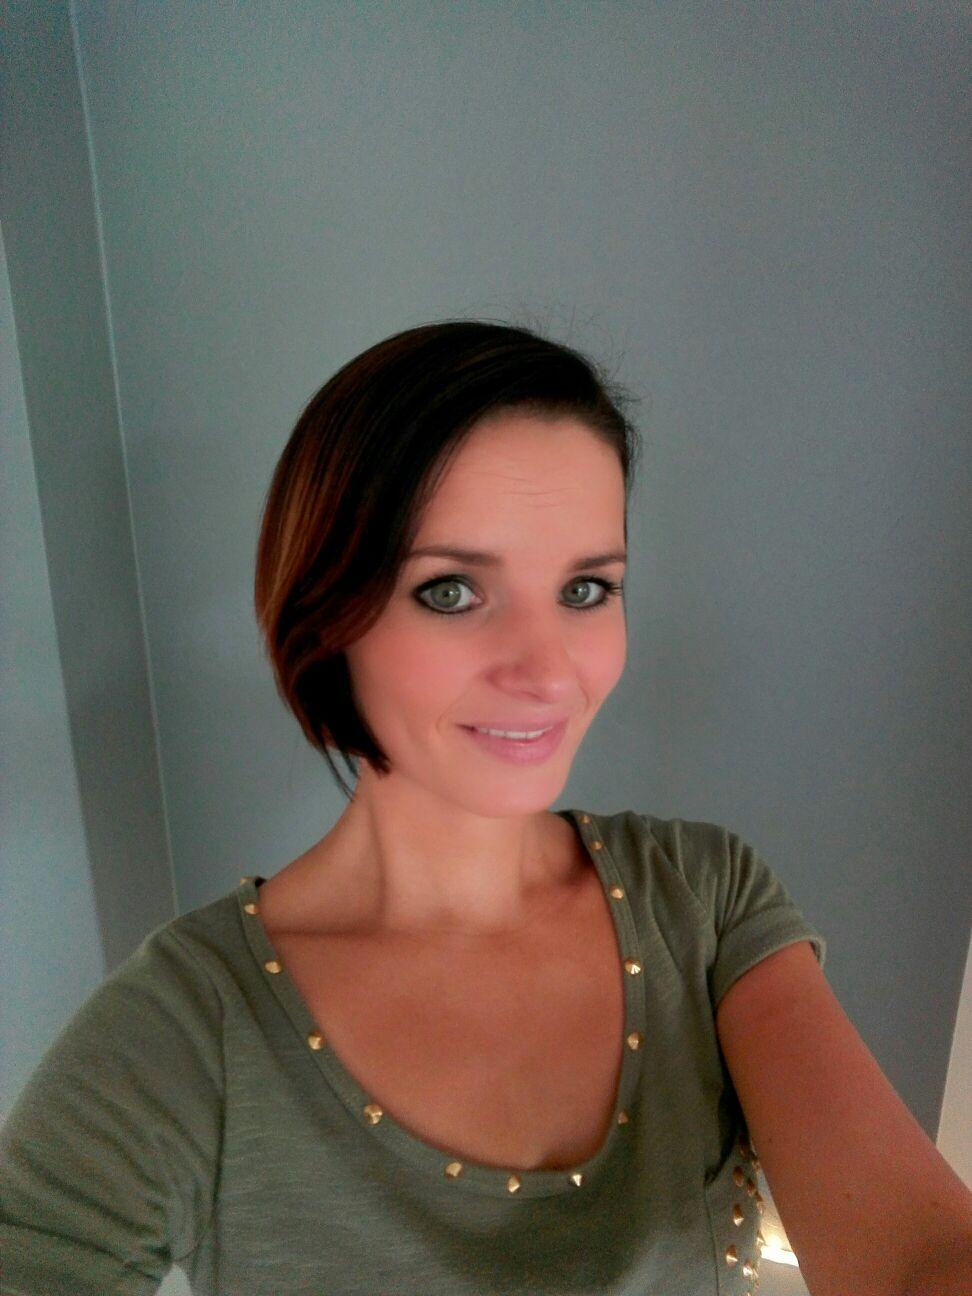 Marjon - Kapper bij Hairfactory Drielanden Harderwijk